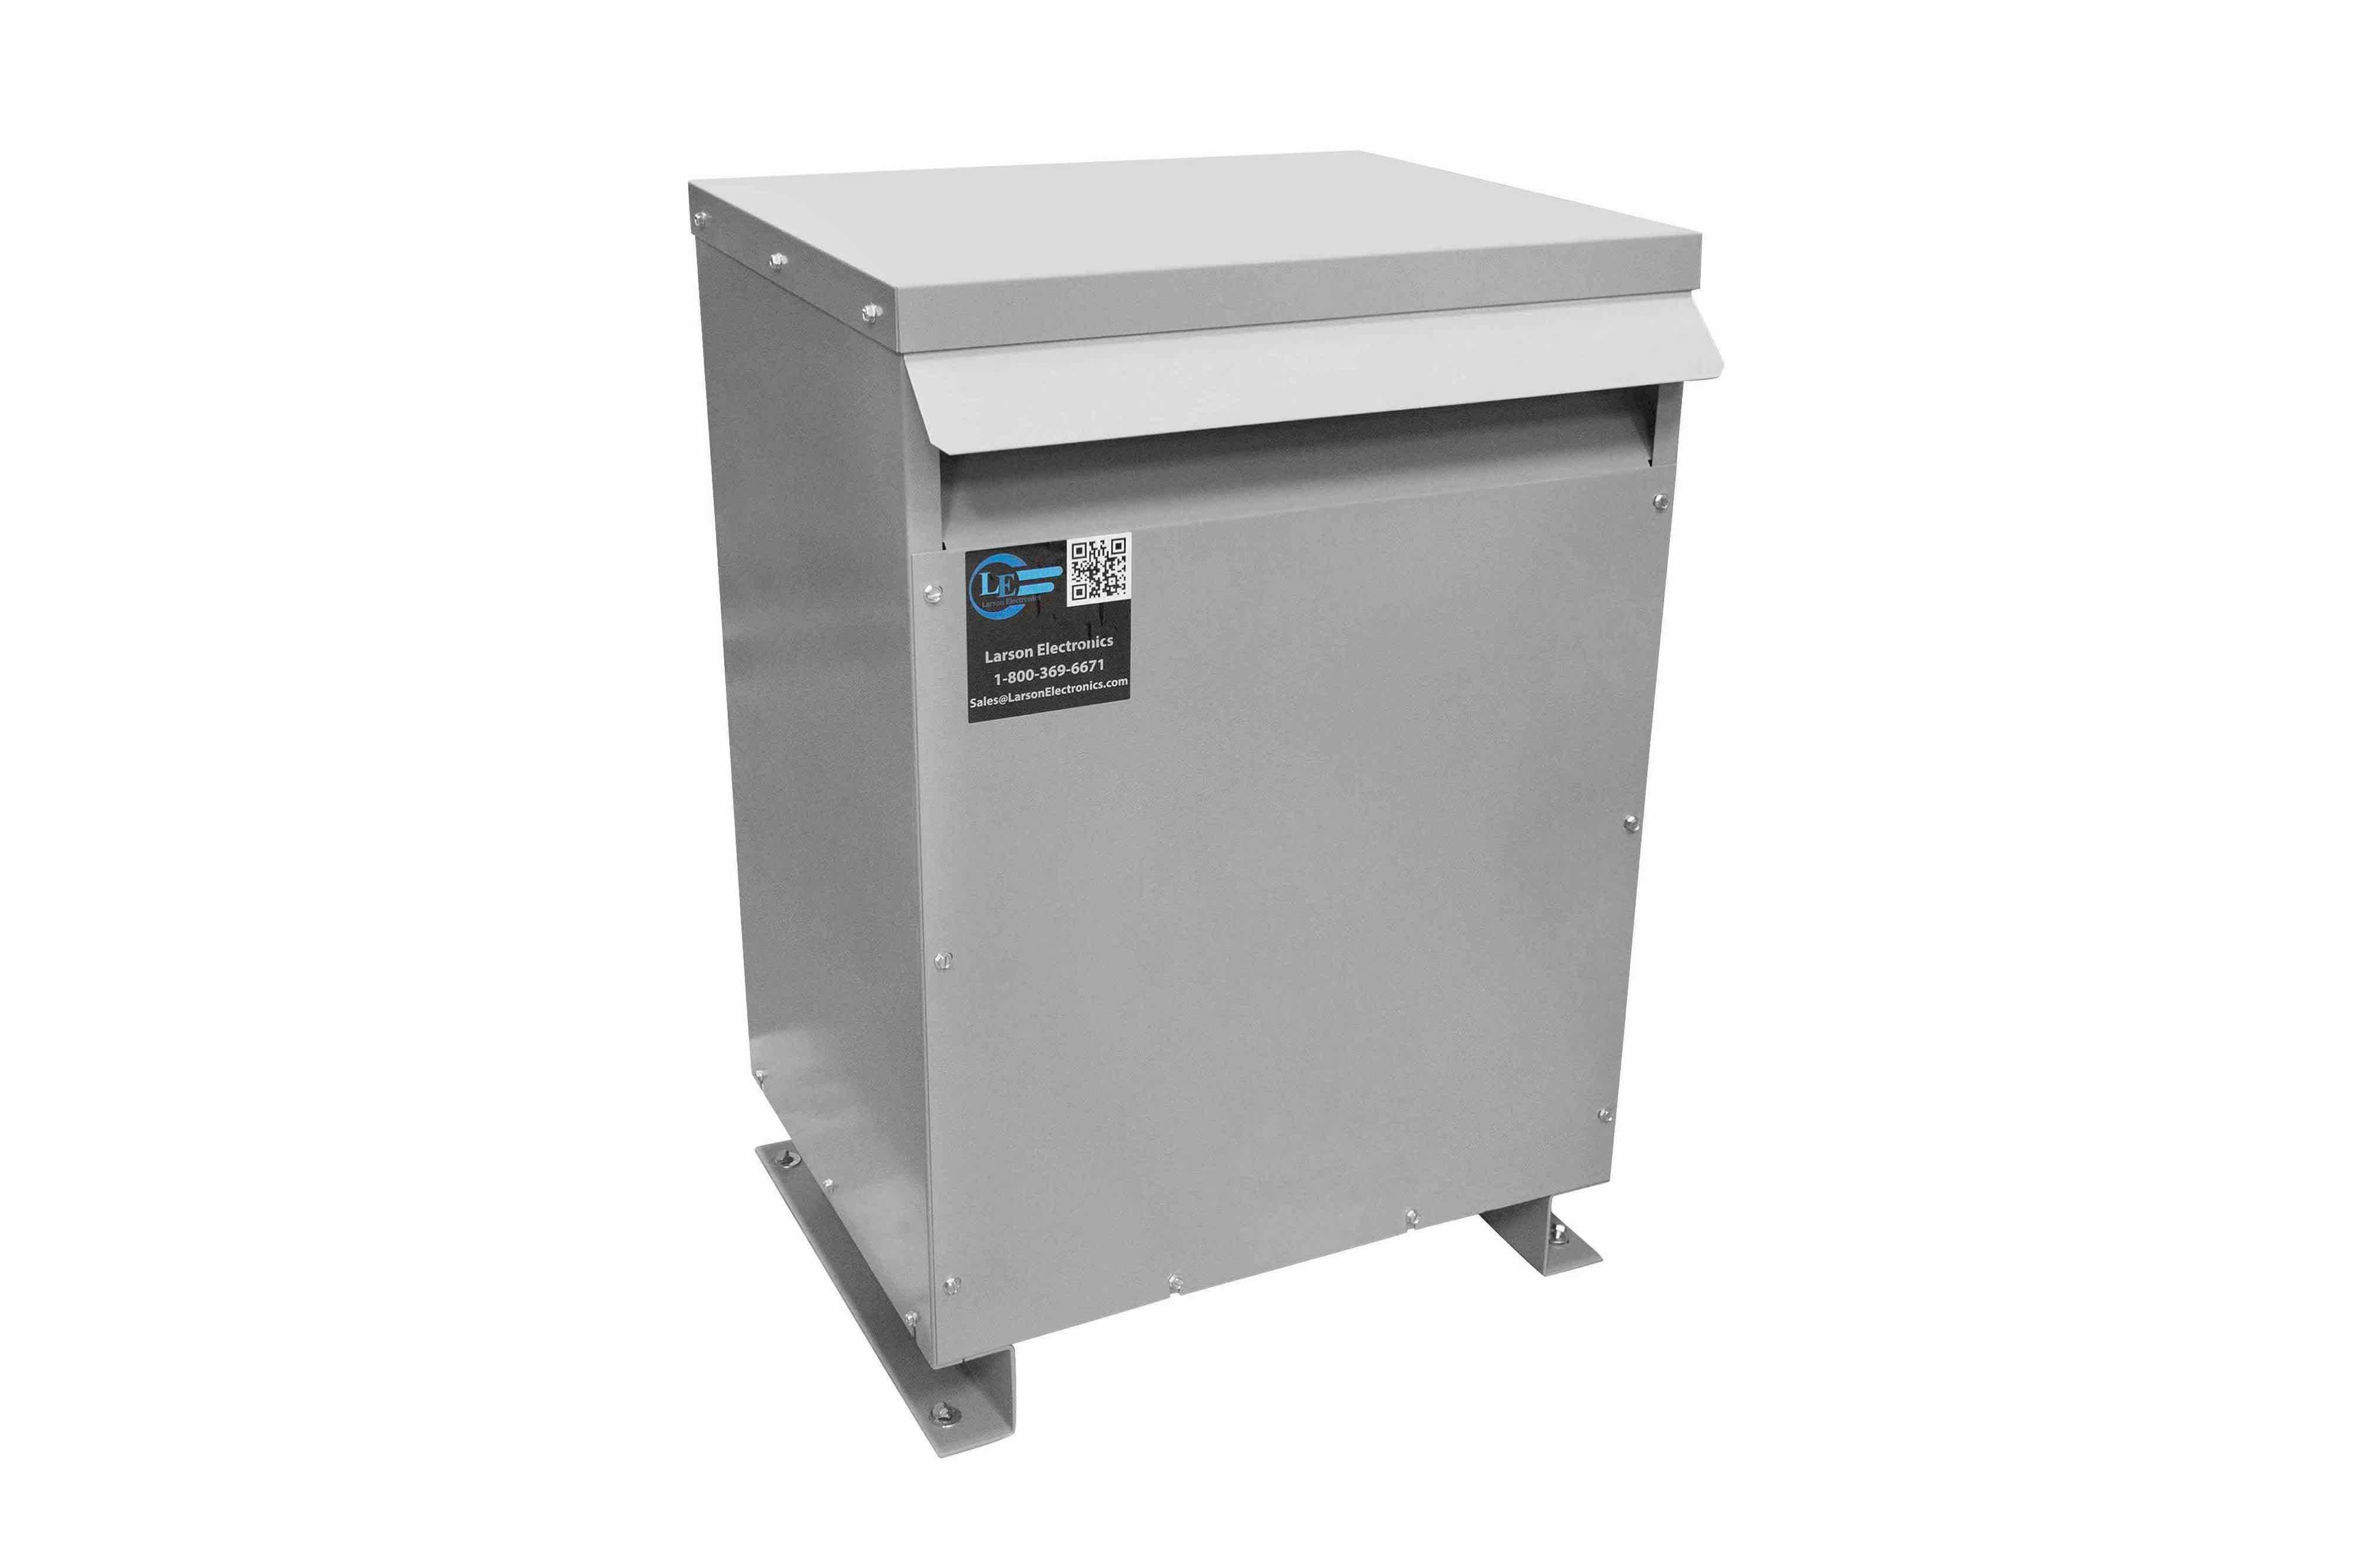 900 kVA 3PH Isolation Transformer, 480V Wye Primary, 400V Delta Secondary, N3R, Ventilated, 60 Hz